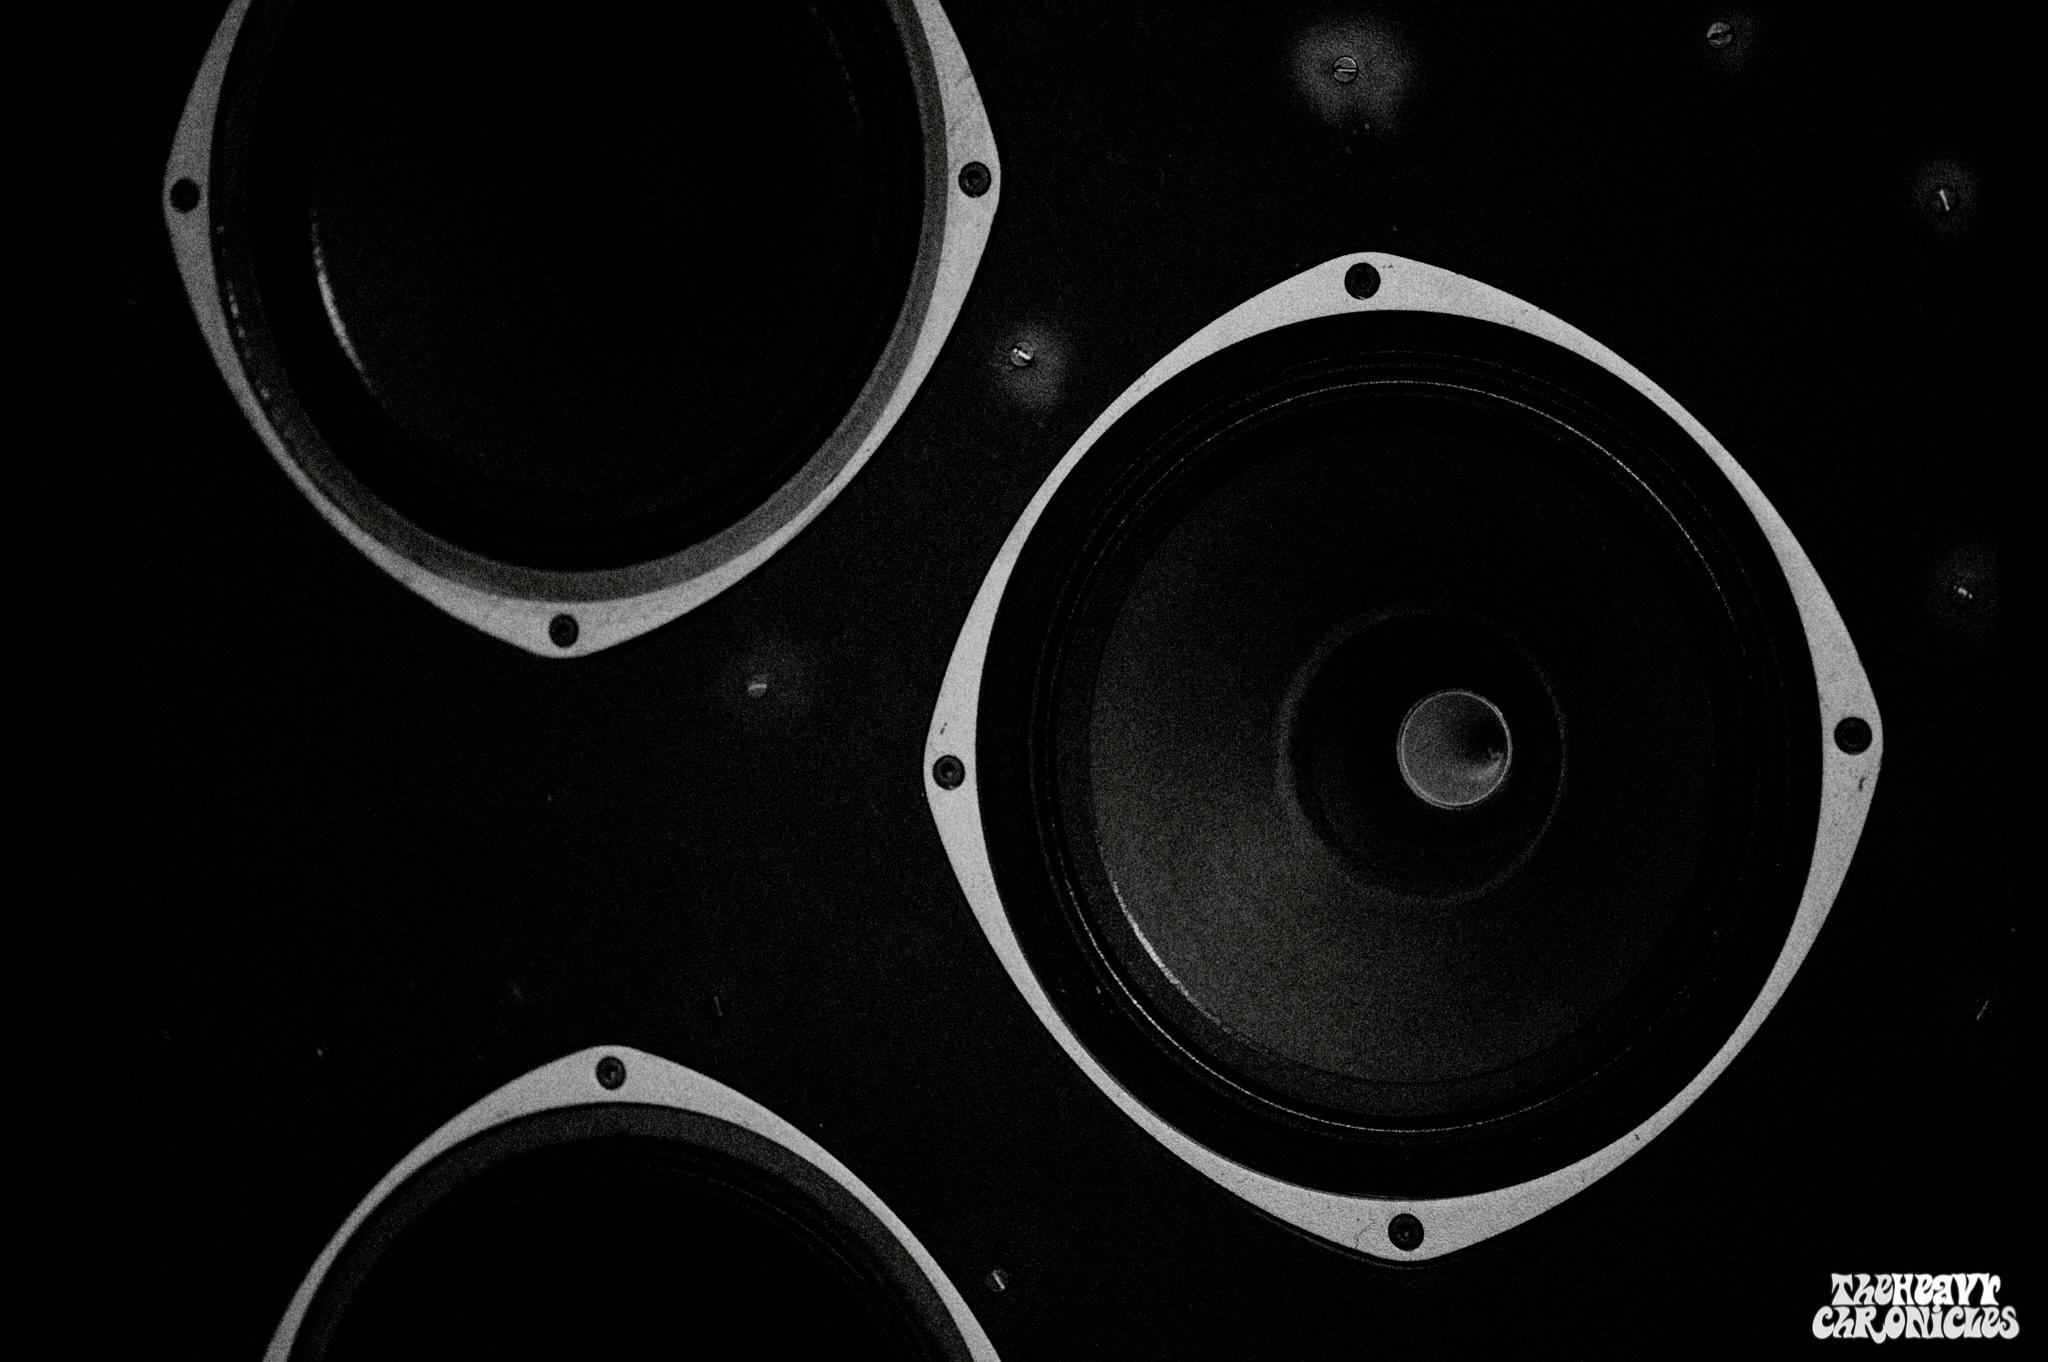 Elder-Studio-Black-Box-2019-Gael-Mathieu-The-Heavy-Chronicles-37